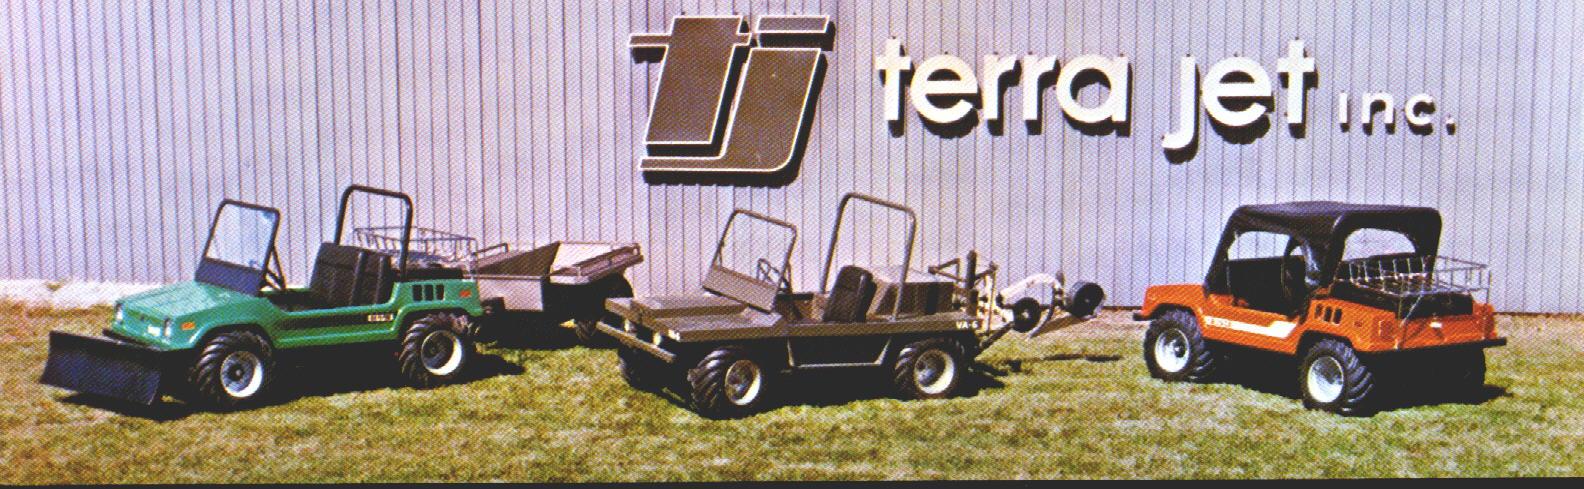 Plant: TERRA-JET U.S.A.   Innis, Louisiana U.S.A.